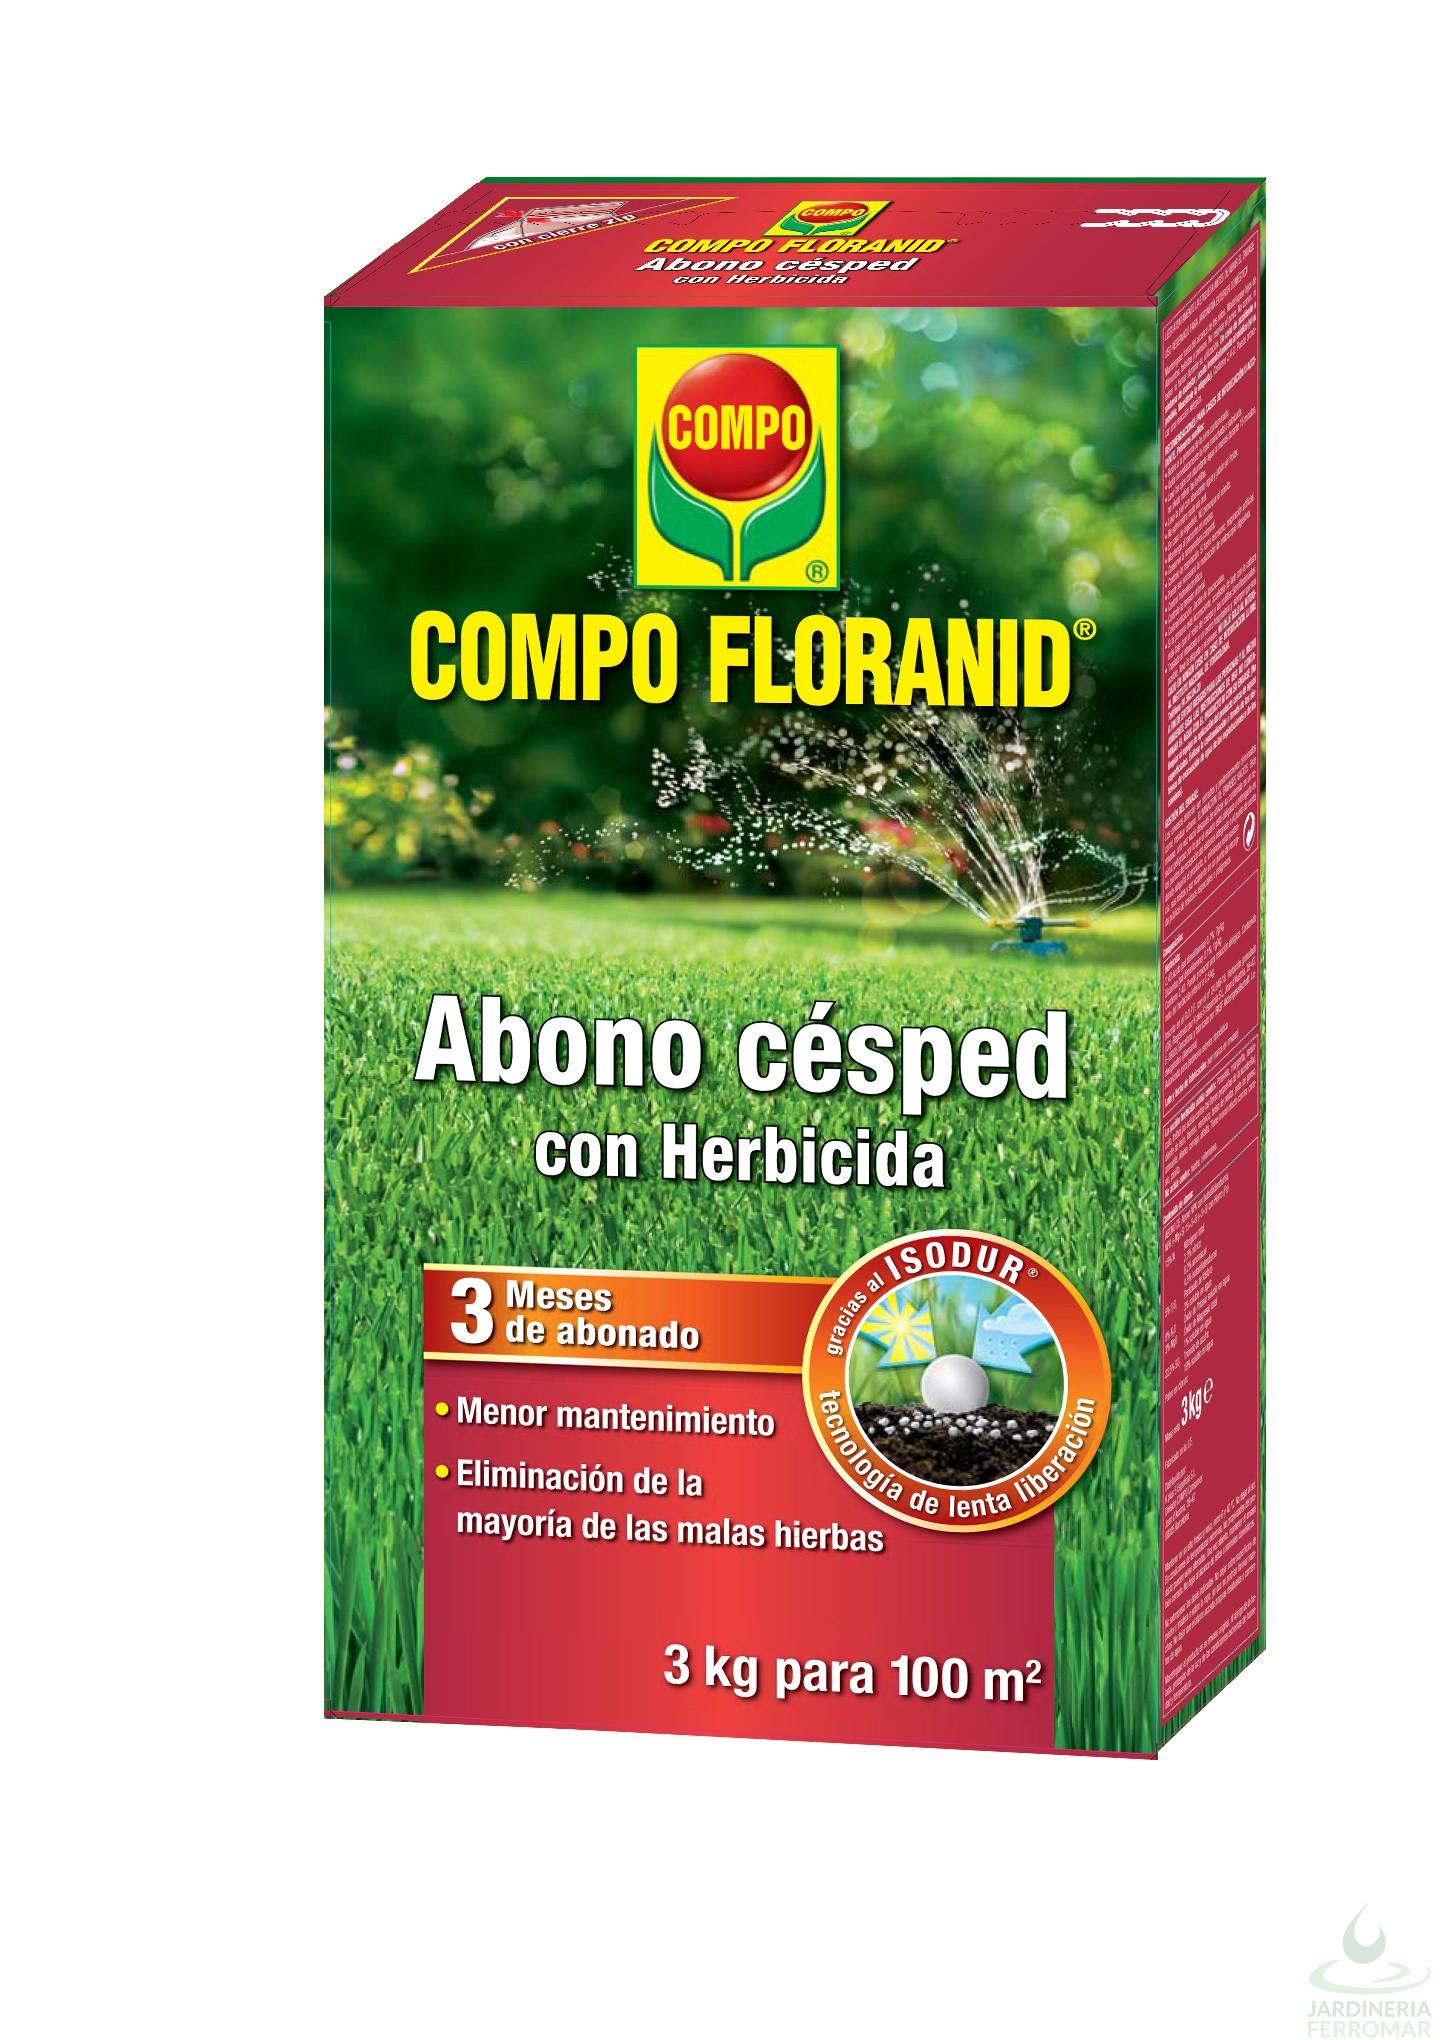 po FLORANID Abono C sped Herbicida Estuche 3 kg